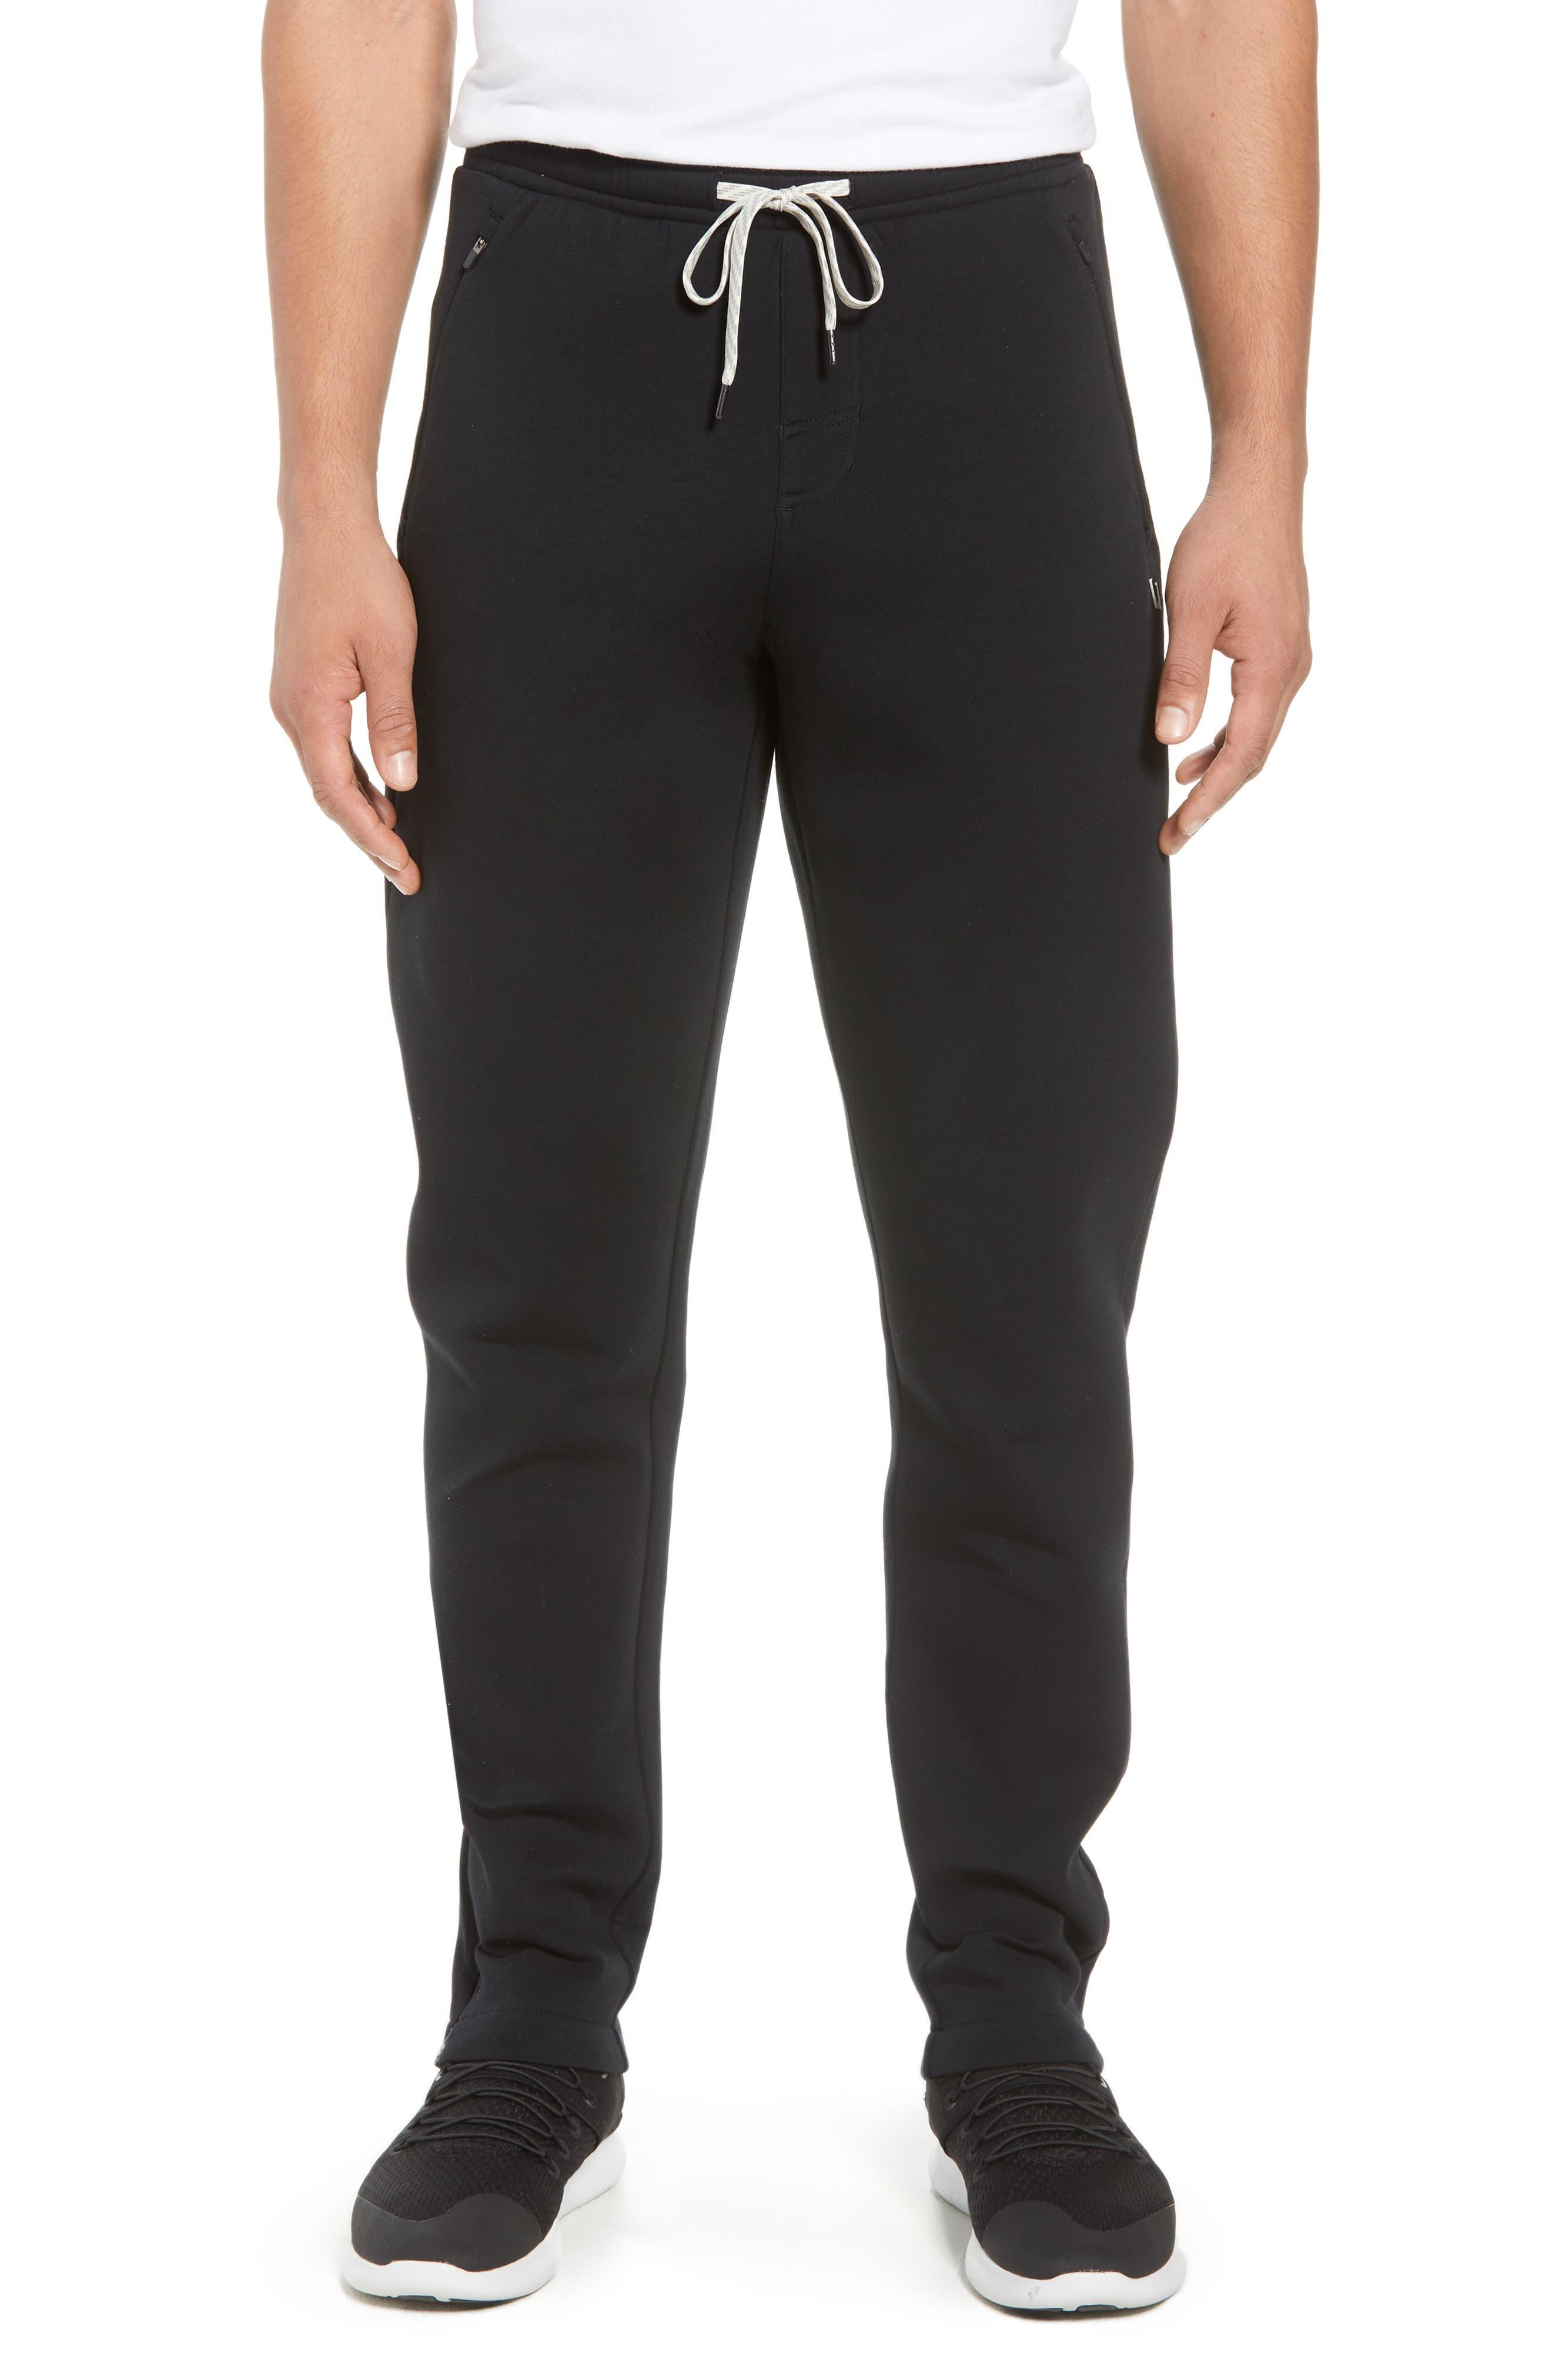 Cosmos Performance Lounge Pants,                             Main thumbnail 1, color,                             BLACK